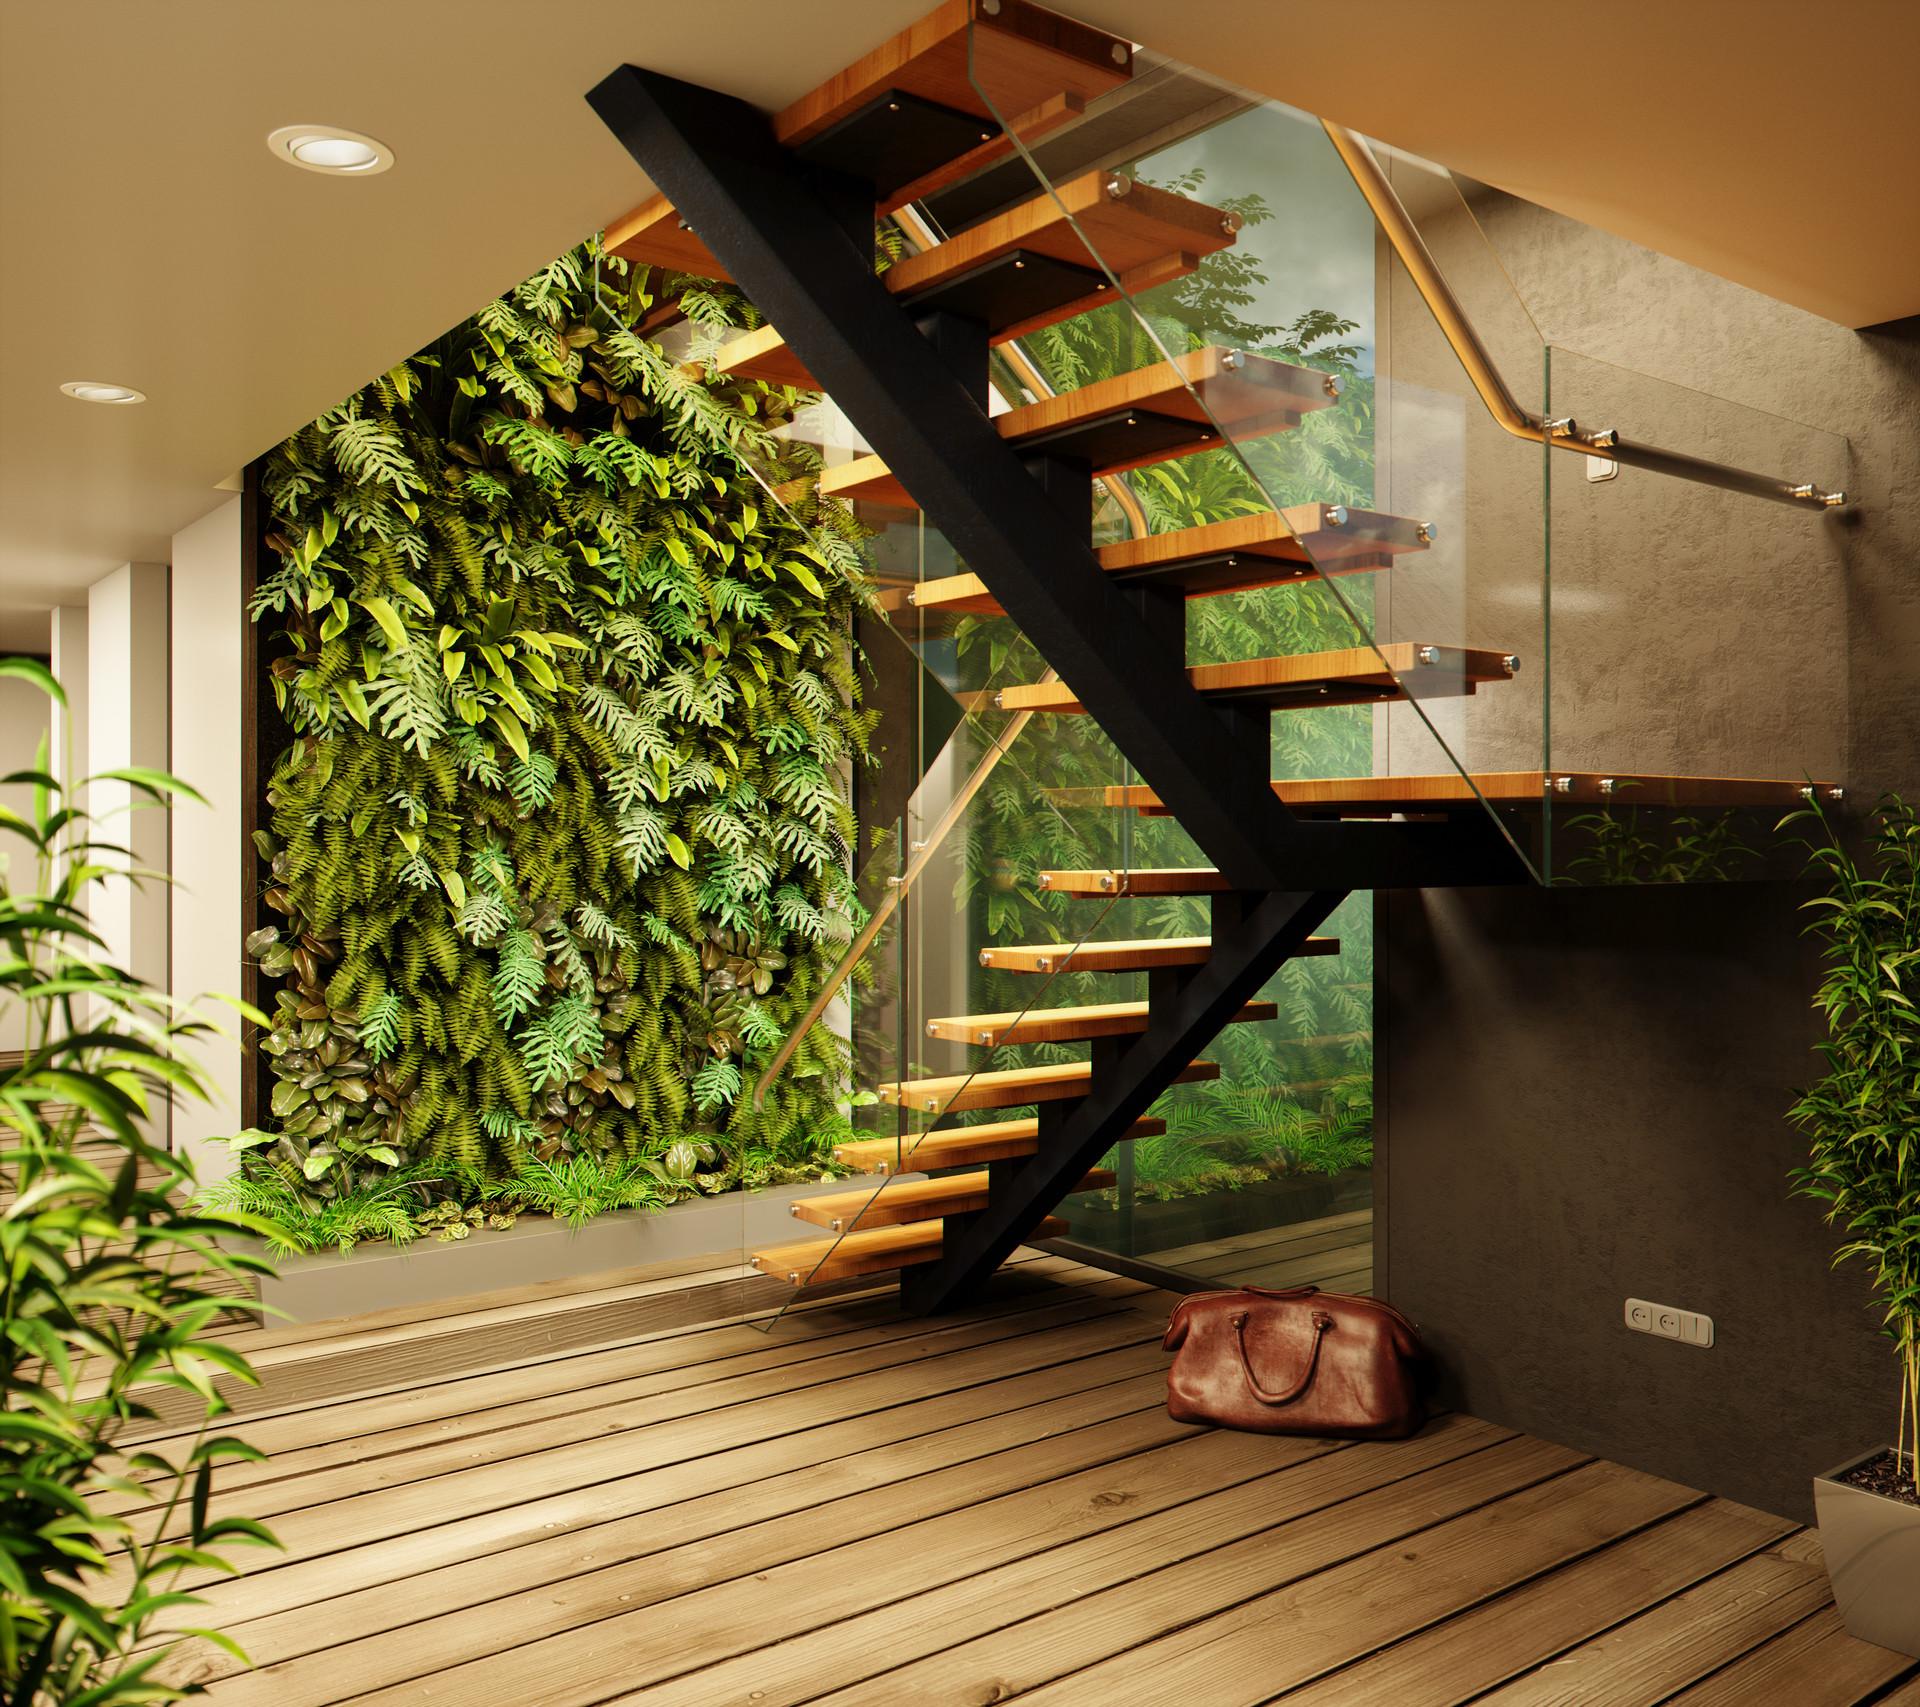 Kartik reddy cam3 stairs wooden